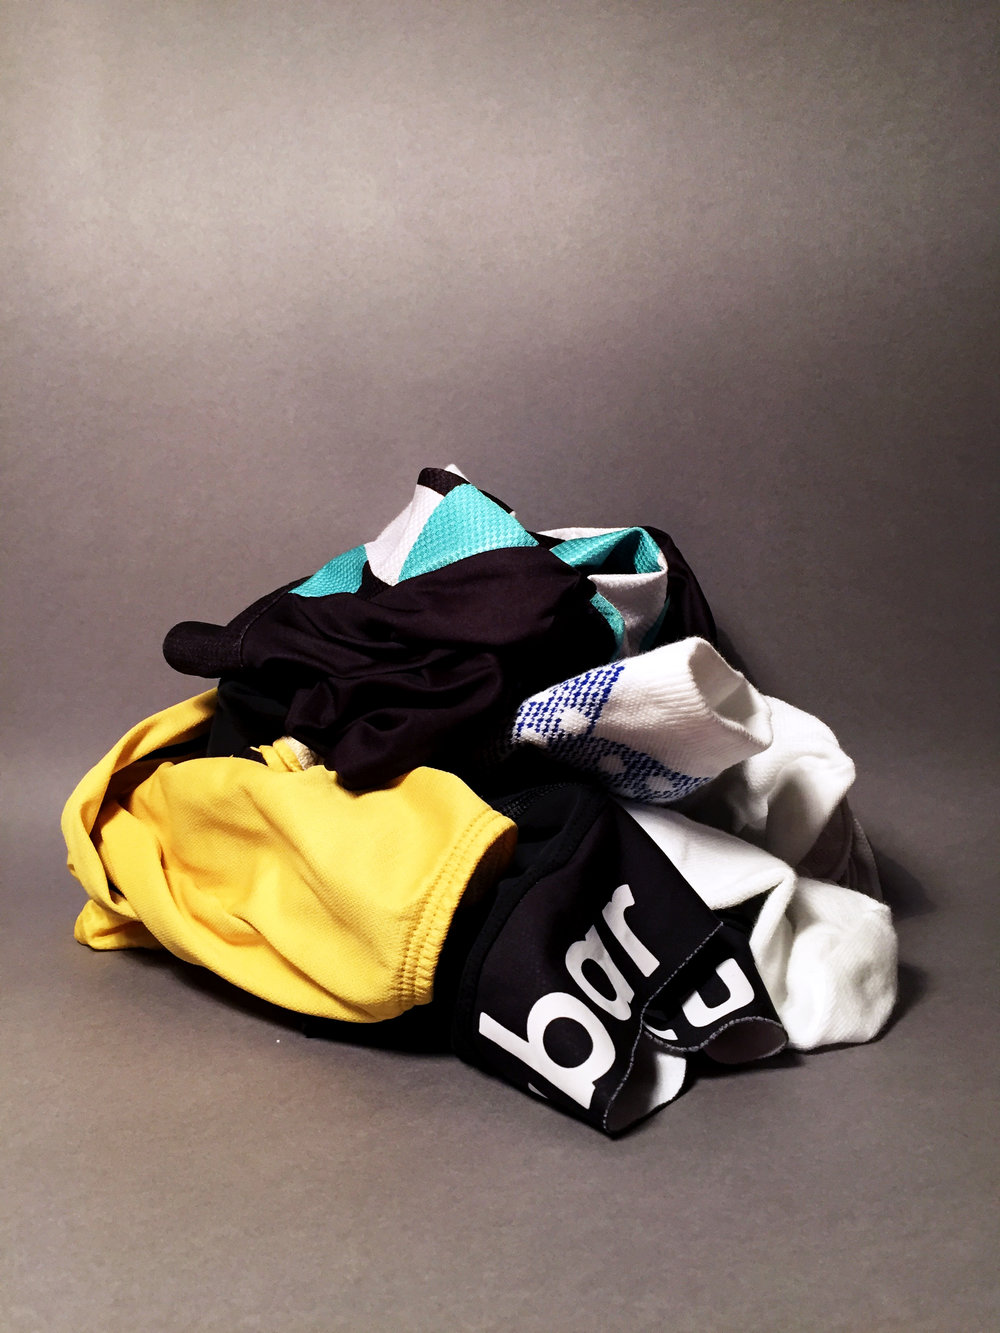 tour wind vest, ss grid jersey, classic bib shorts, puncheur socks